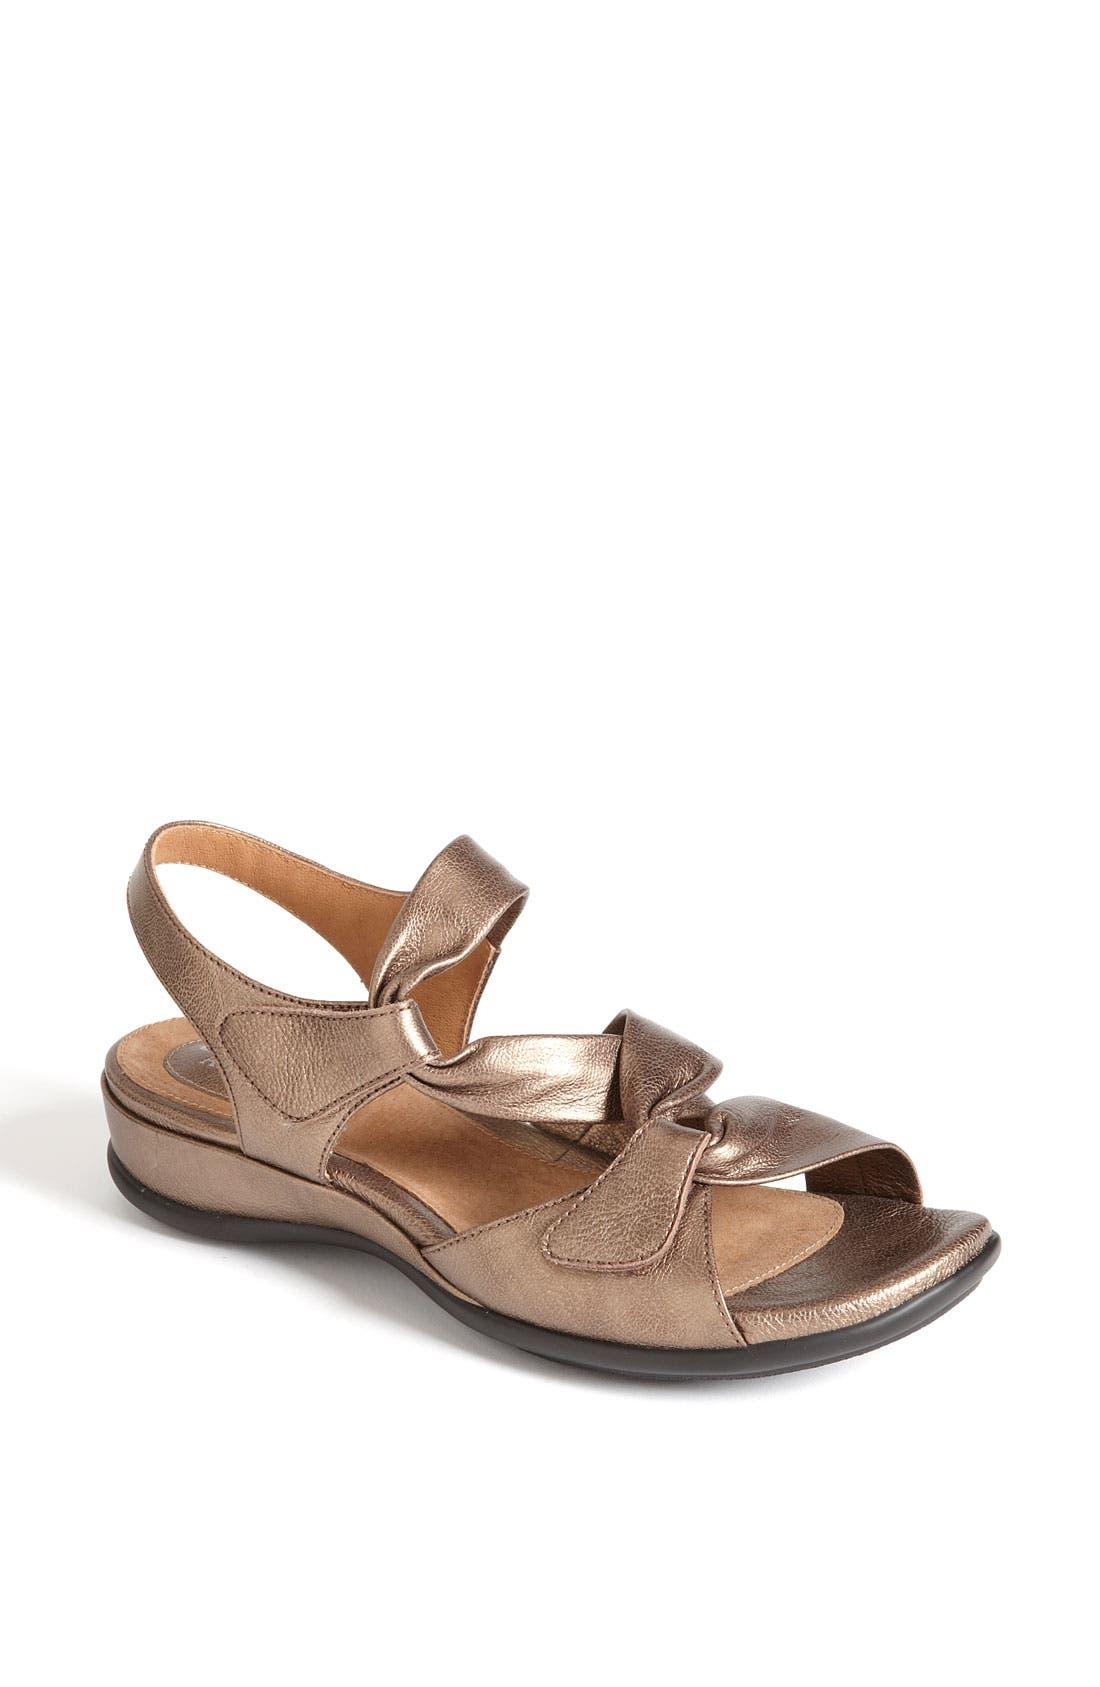 Alternate Image 1 Selected - Clarks® 'Lucena' Sandal